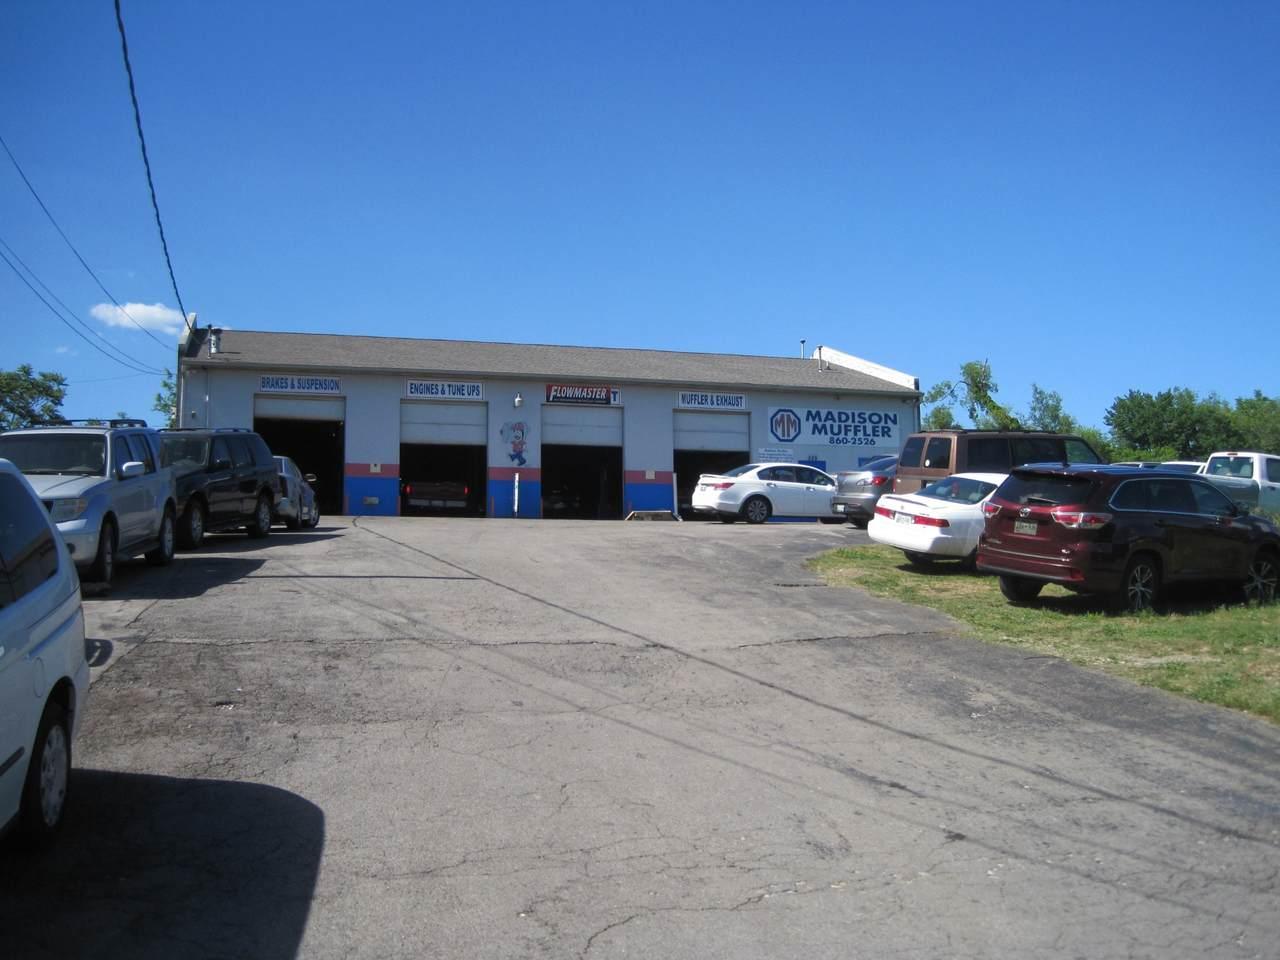 529 E Old Hickory Blvd - Photo 1